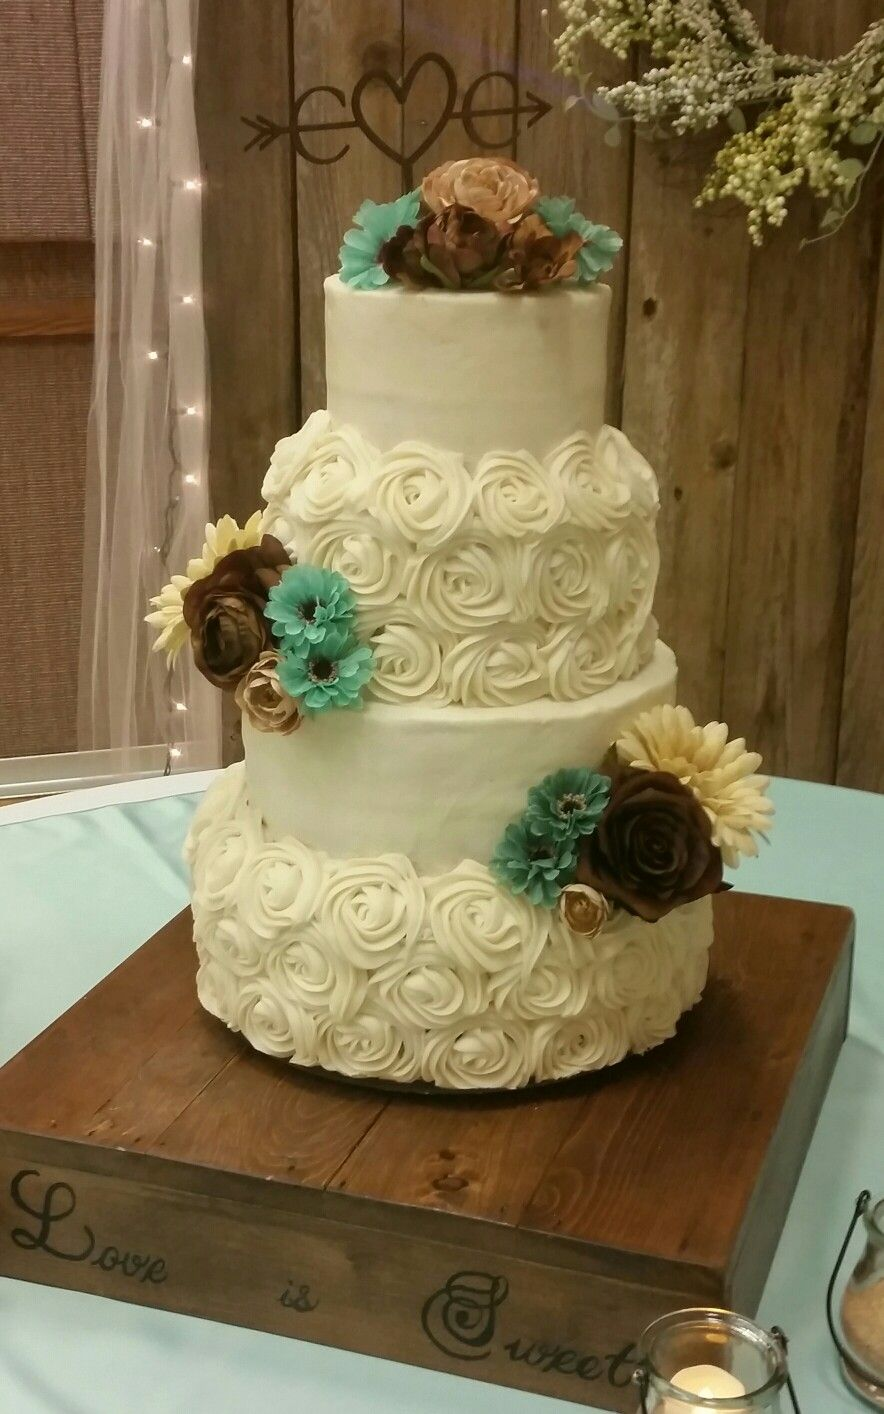 Cox wedding cake 10-15-16   My personal cakes   Pinterest   Wedding cake